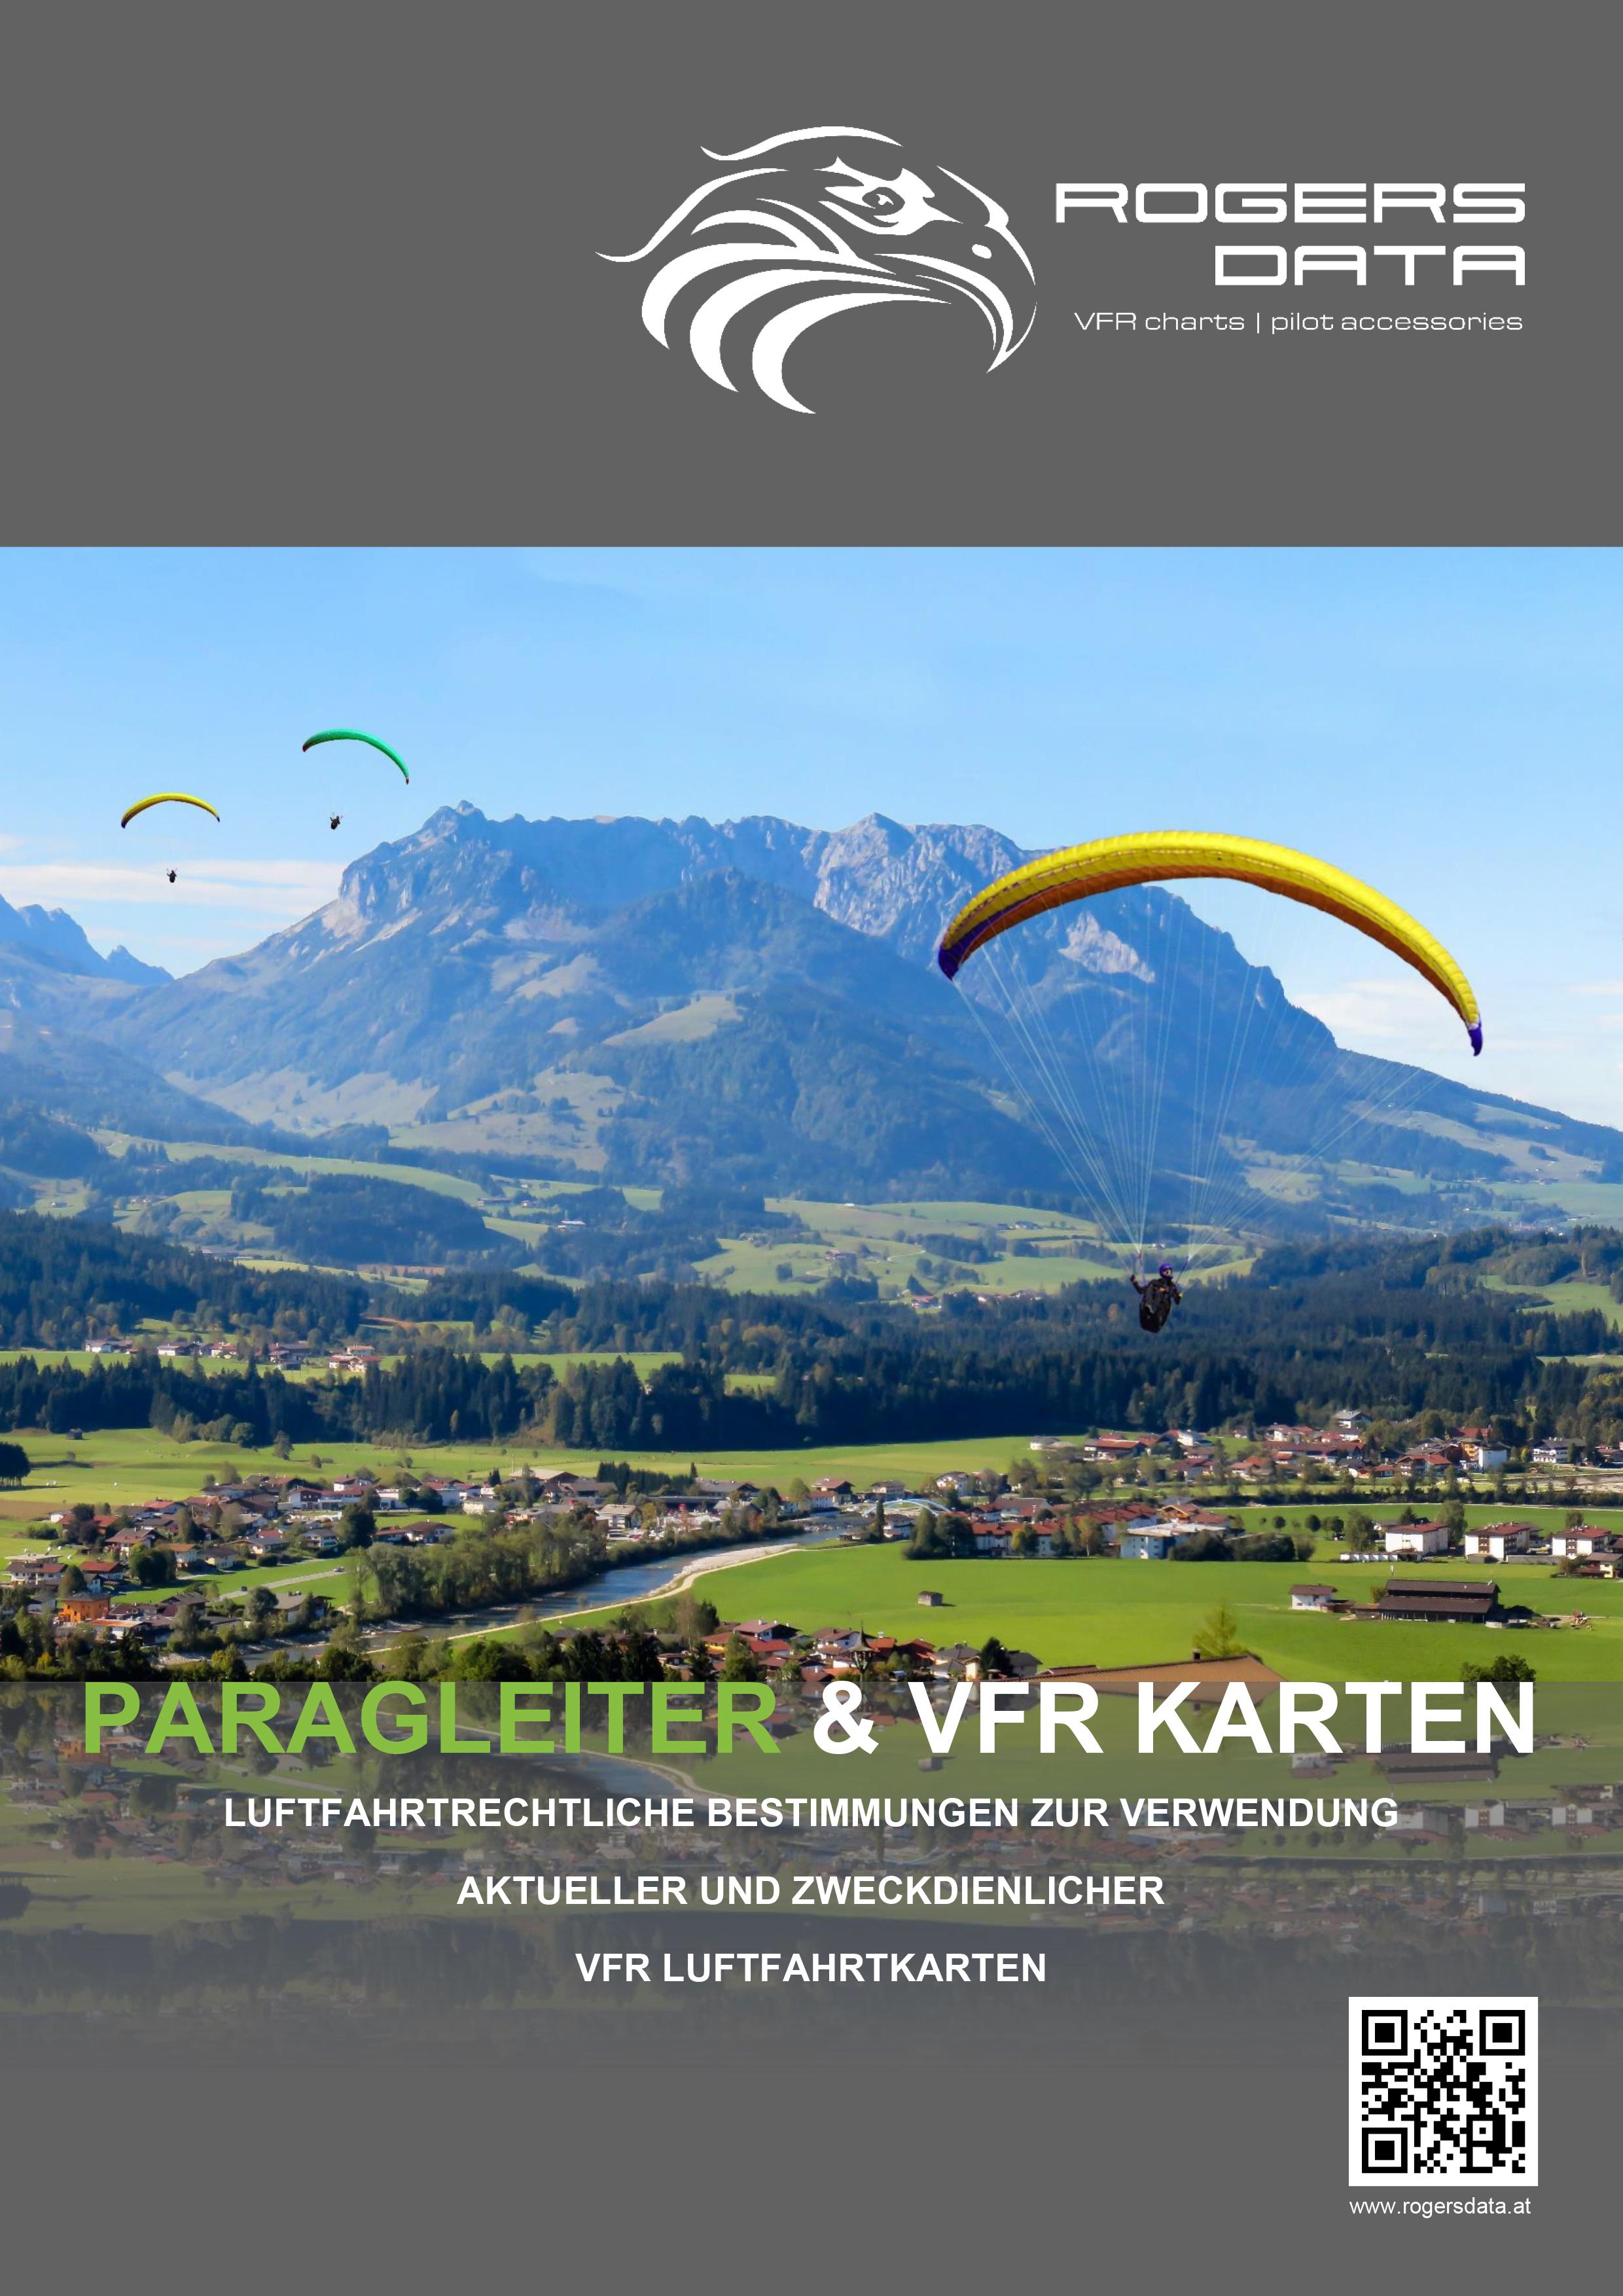 Paragliding and VFR charts